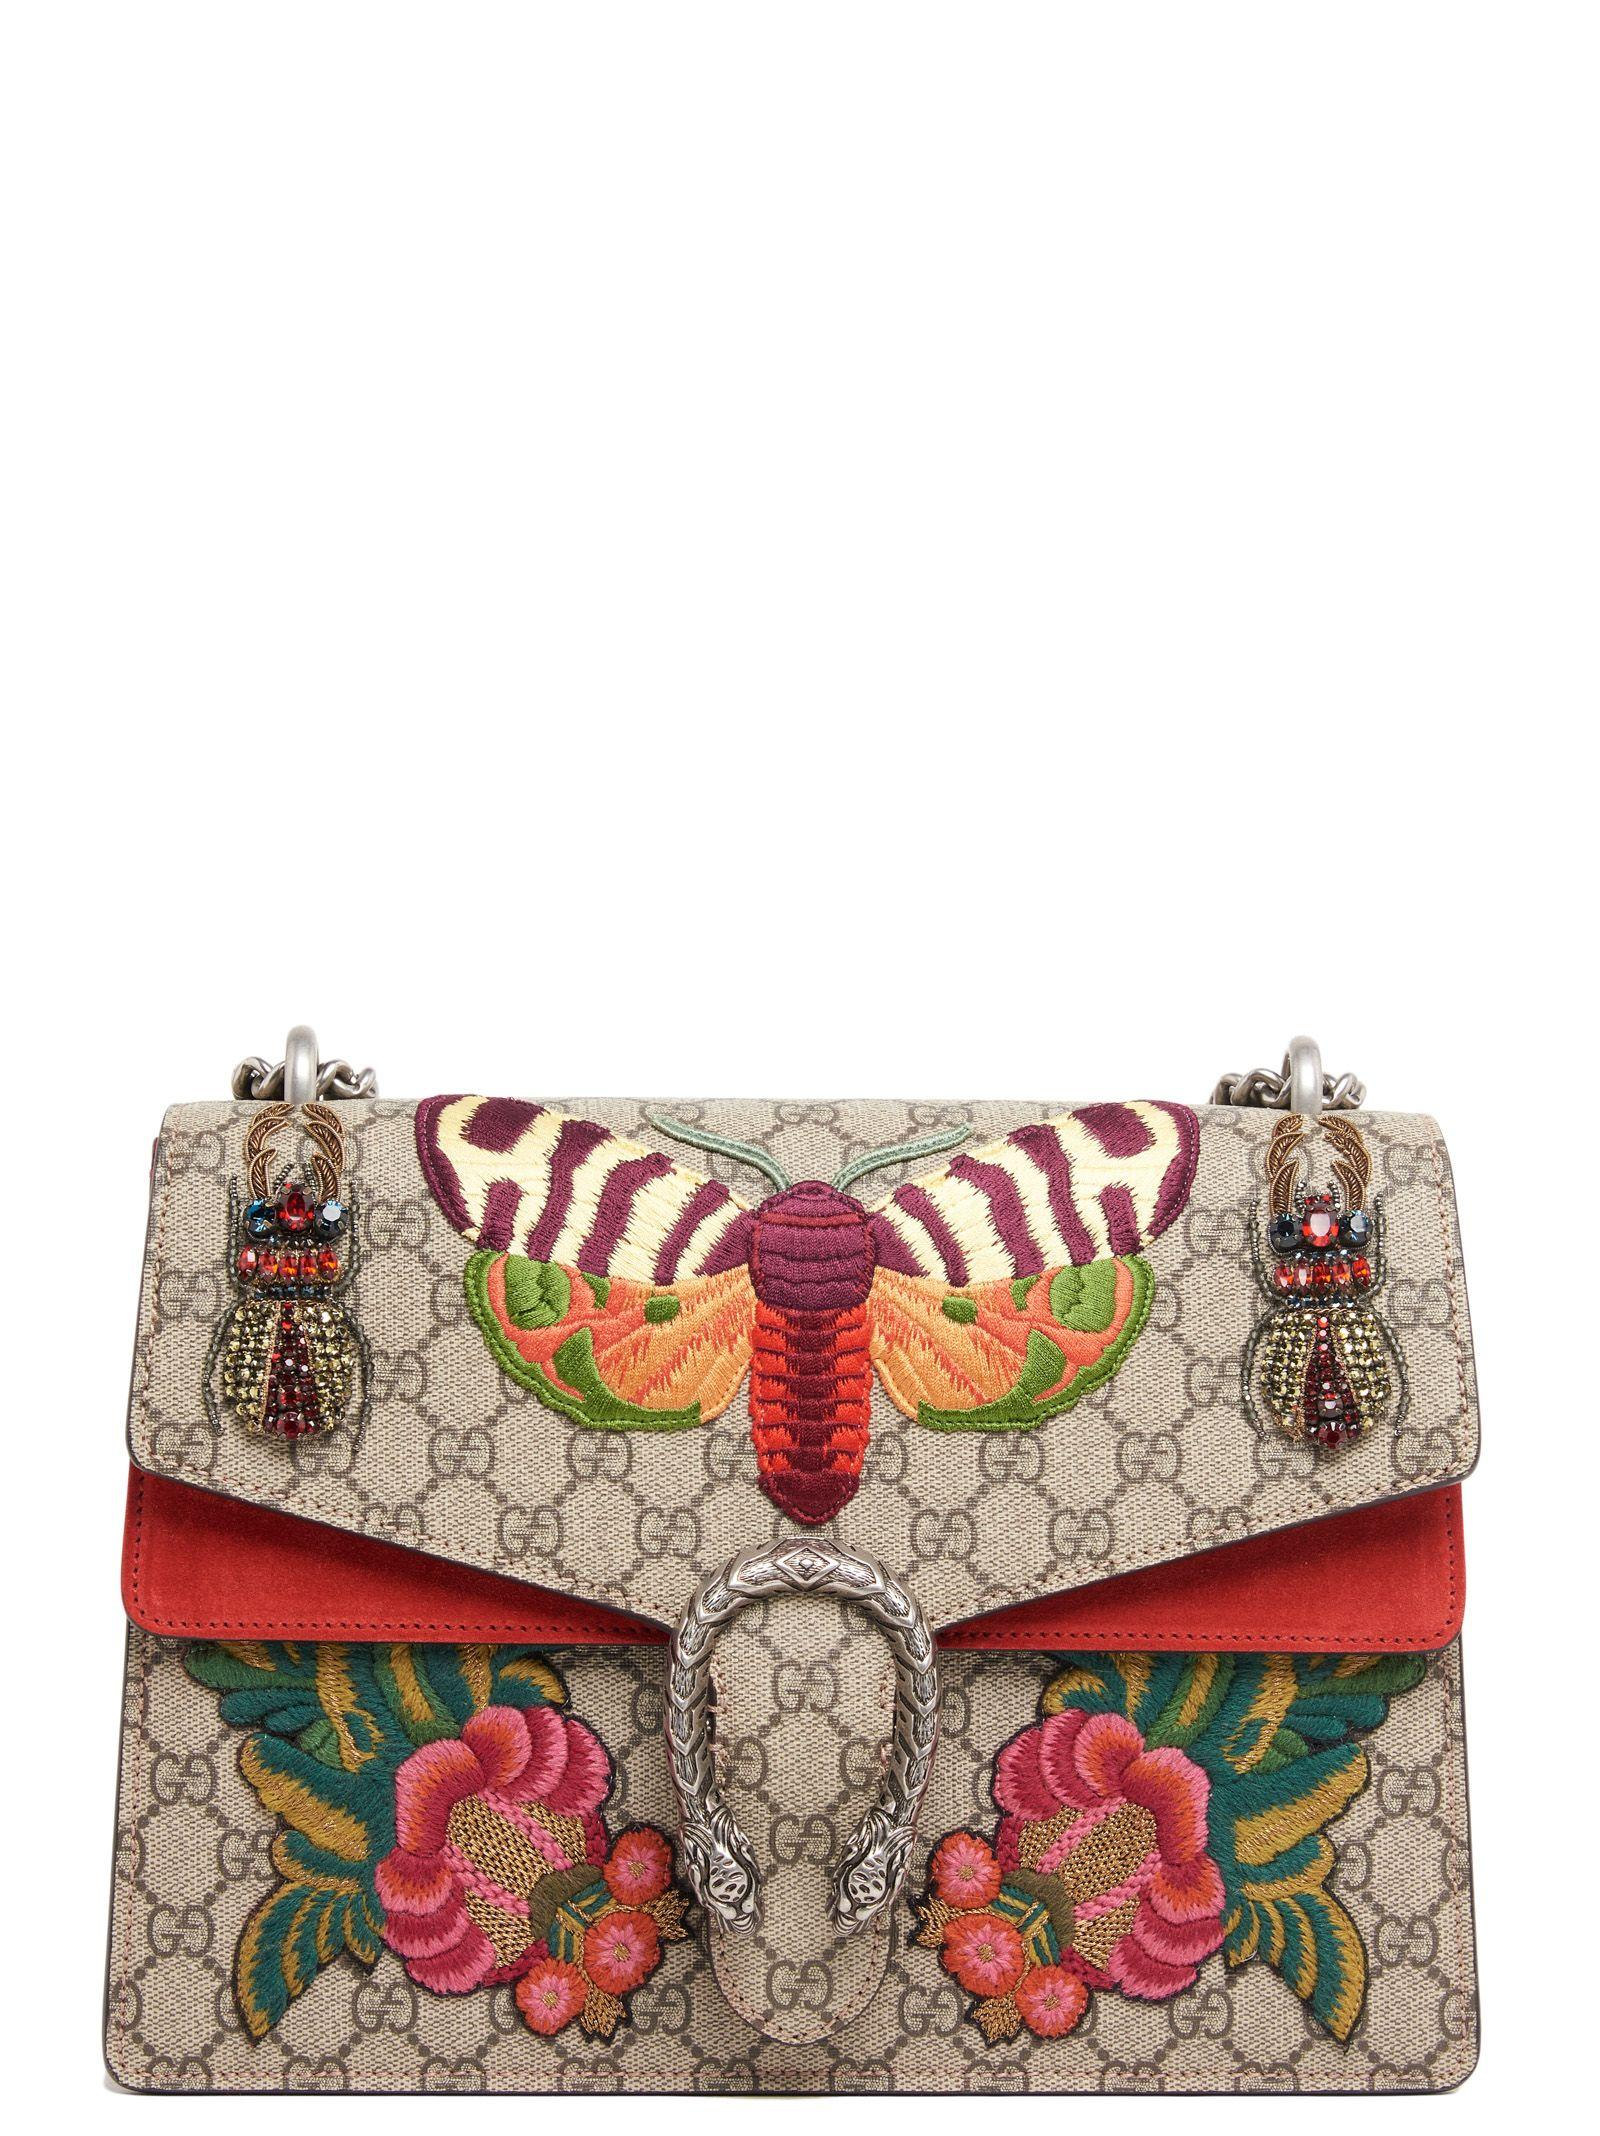 253d1f745 Gucci Dionysus Moth Medium Gg Supreme Shoulder Bag In Multicolor ...